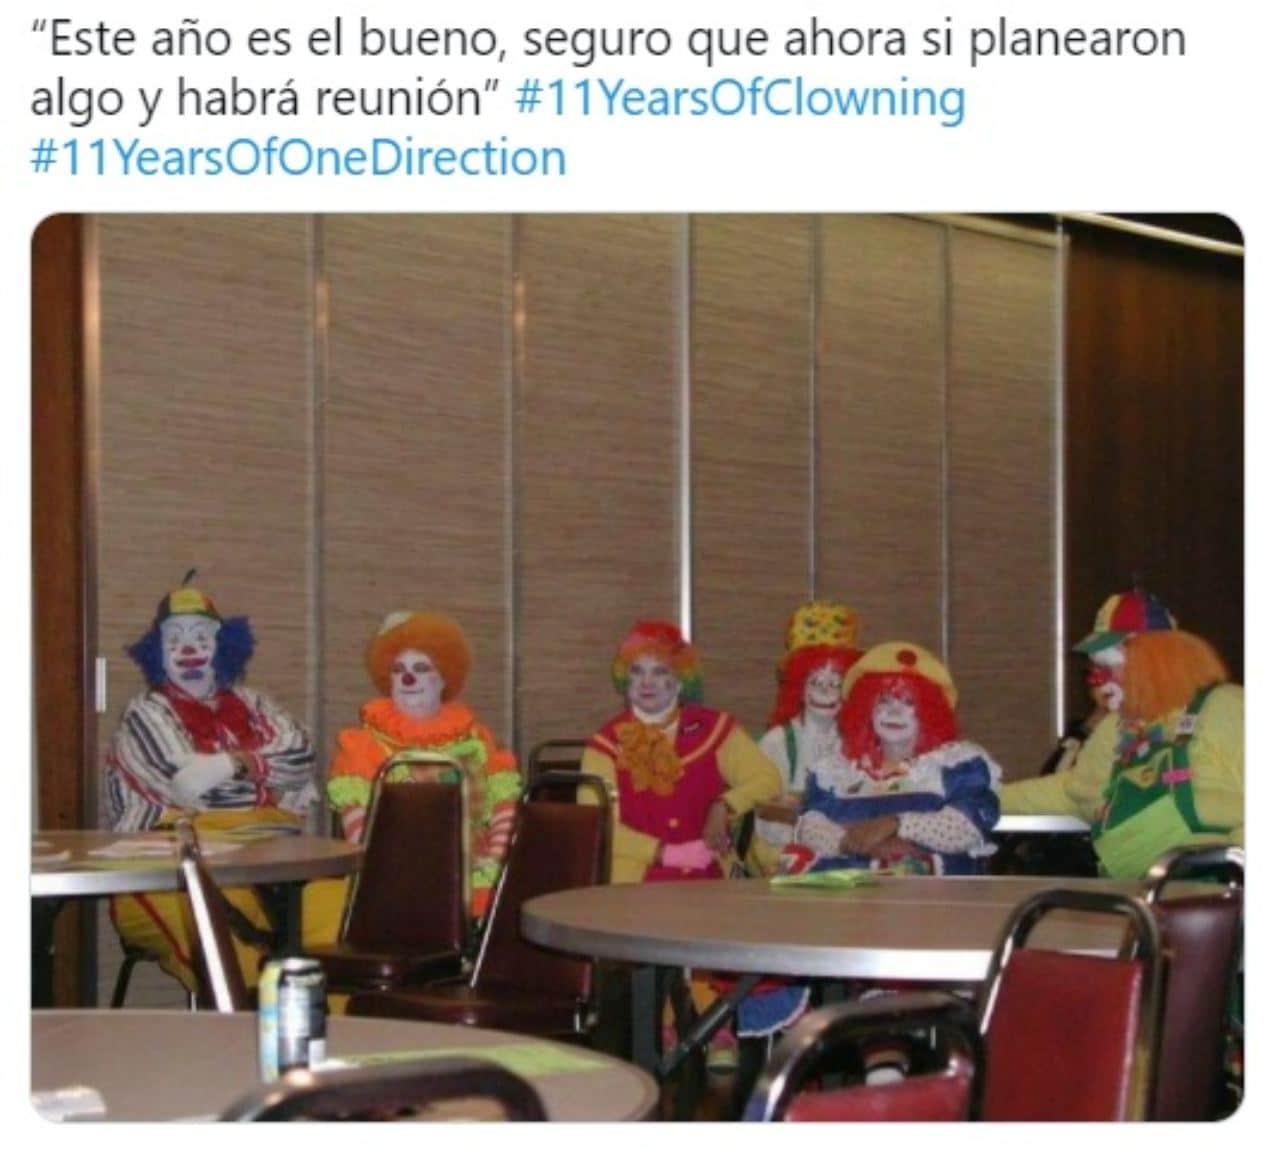 meme payasos del reencuentro one direction